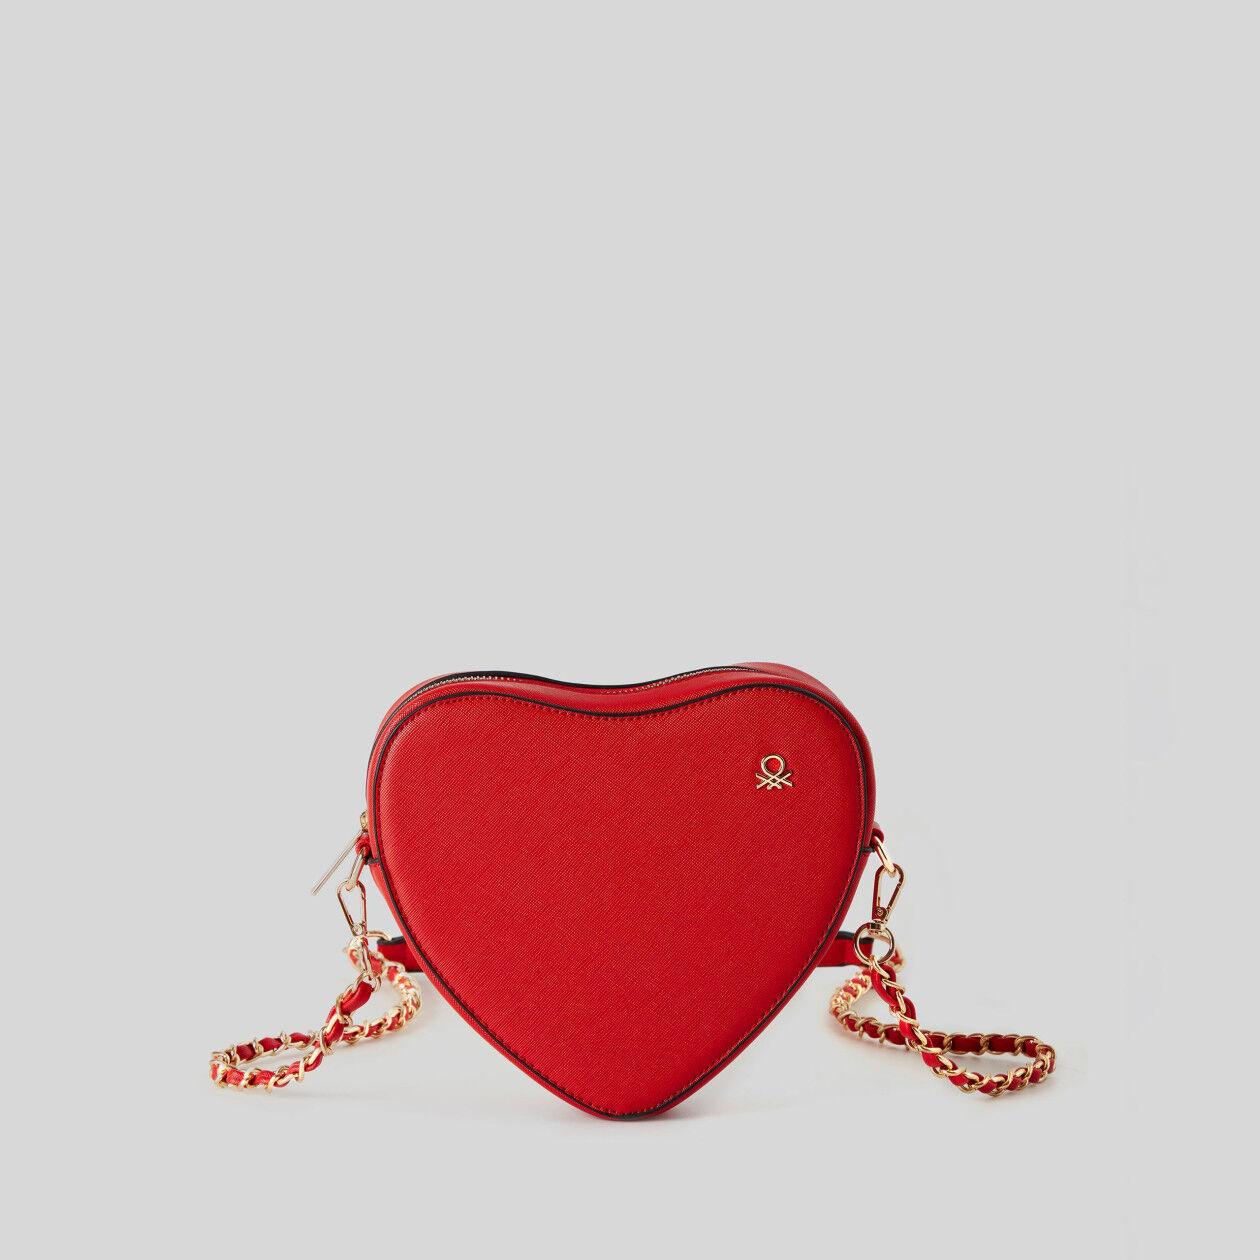 Heart purse with crossbody strap